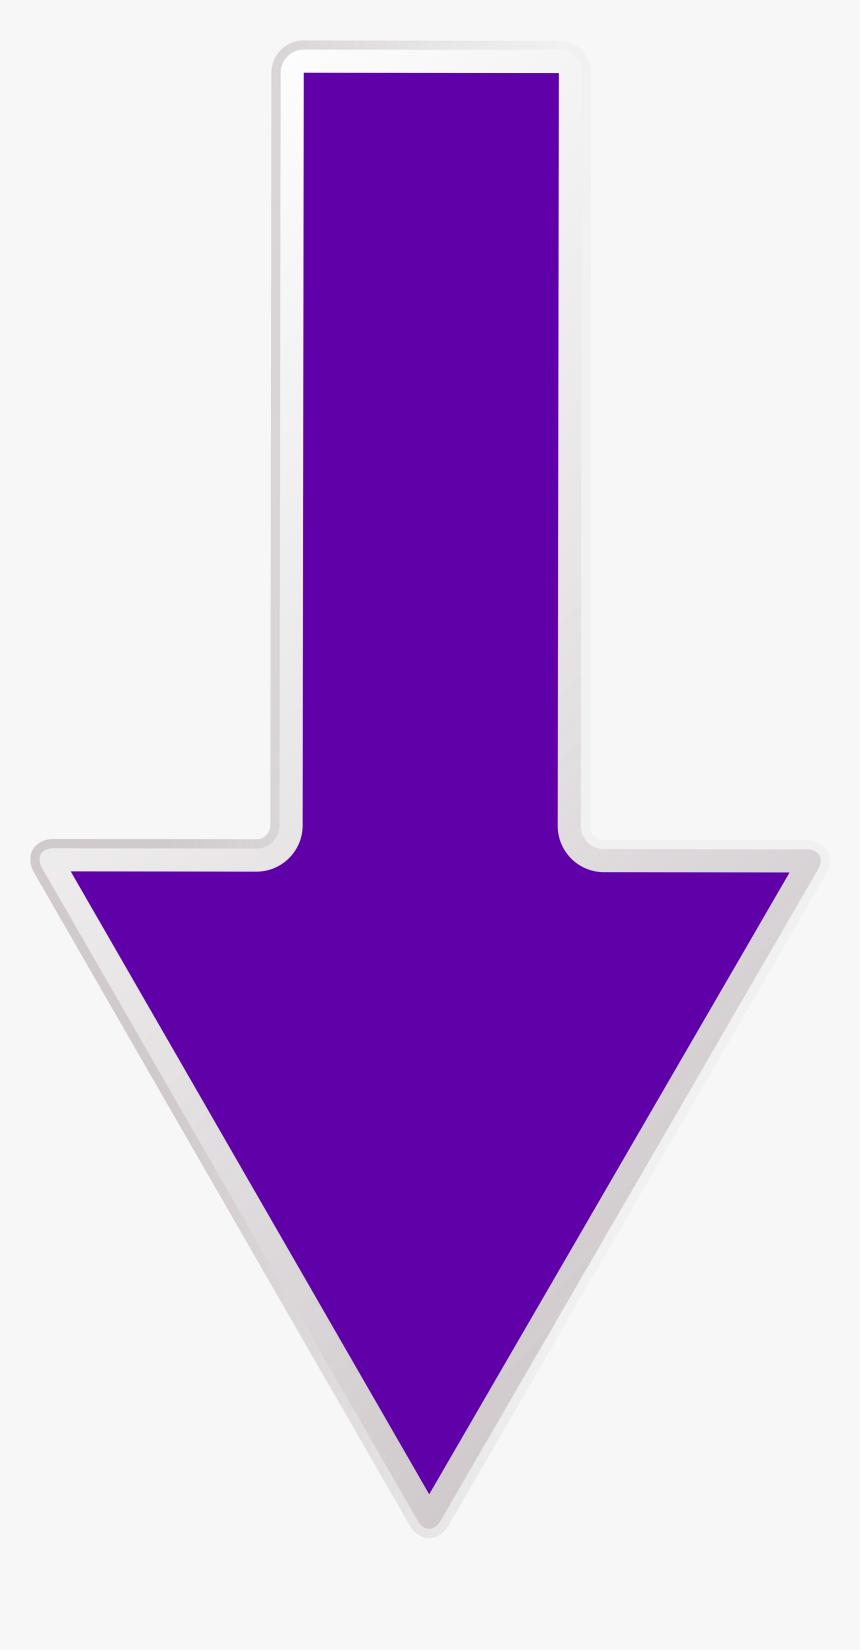 Arrow Purple Down Transparent - Purple Down Arrow Gif, HD Png Download, Free Download